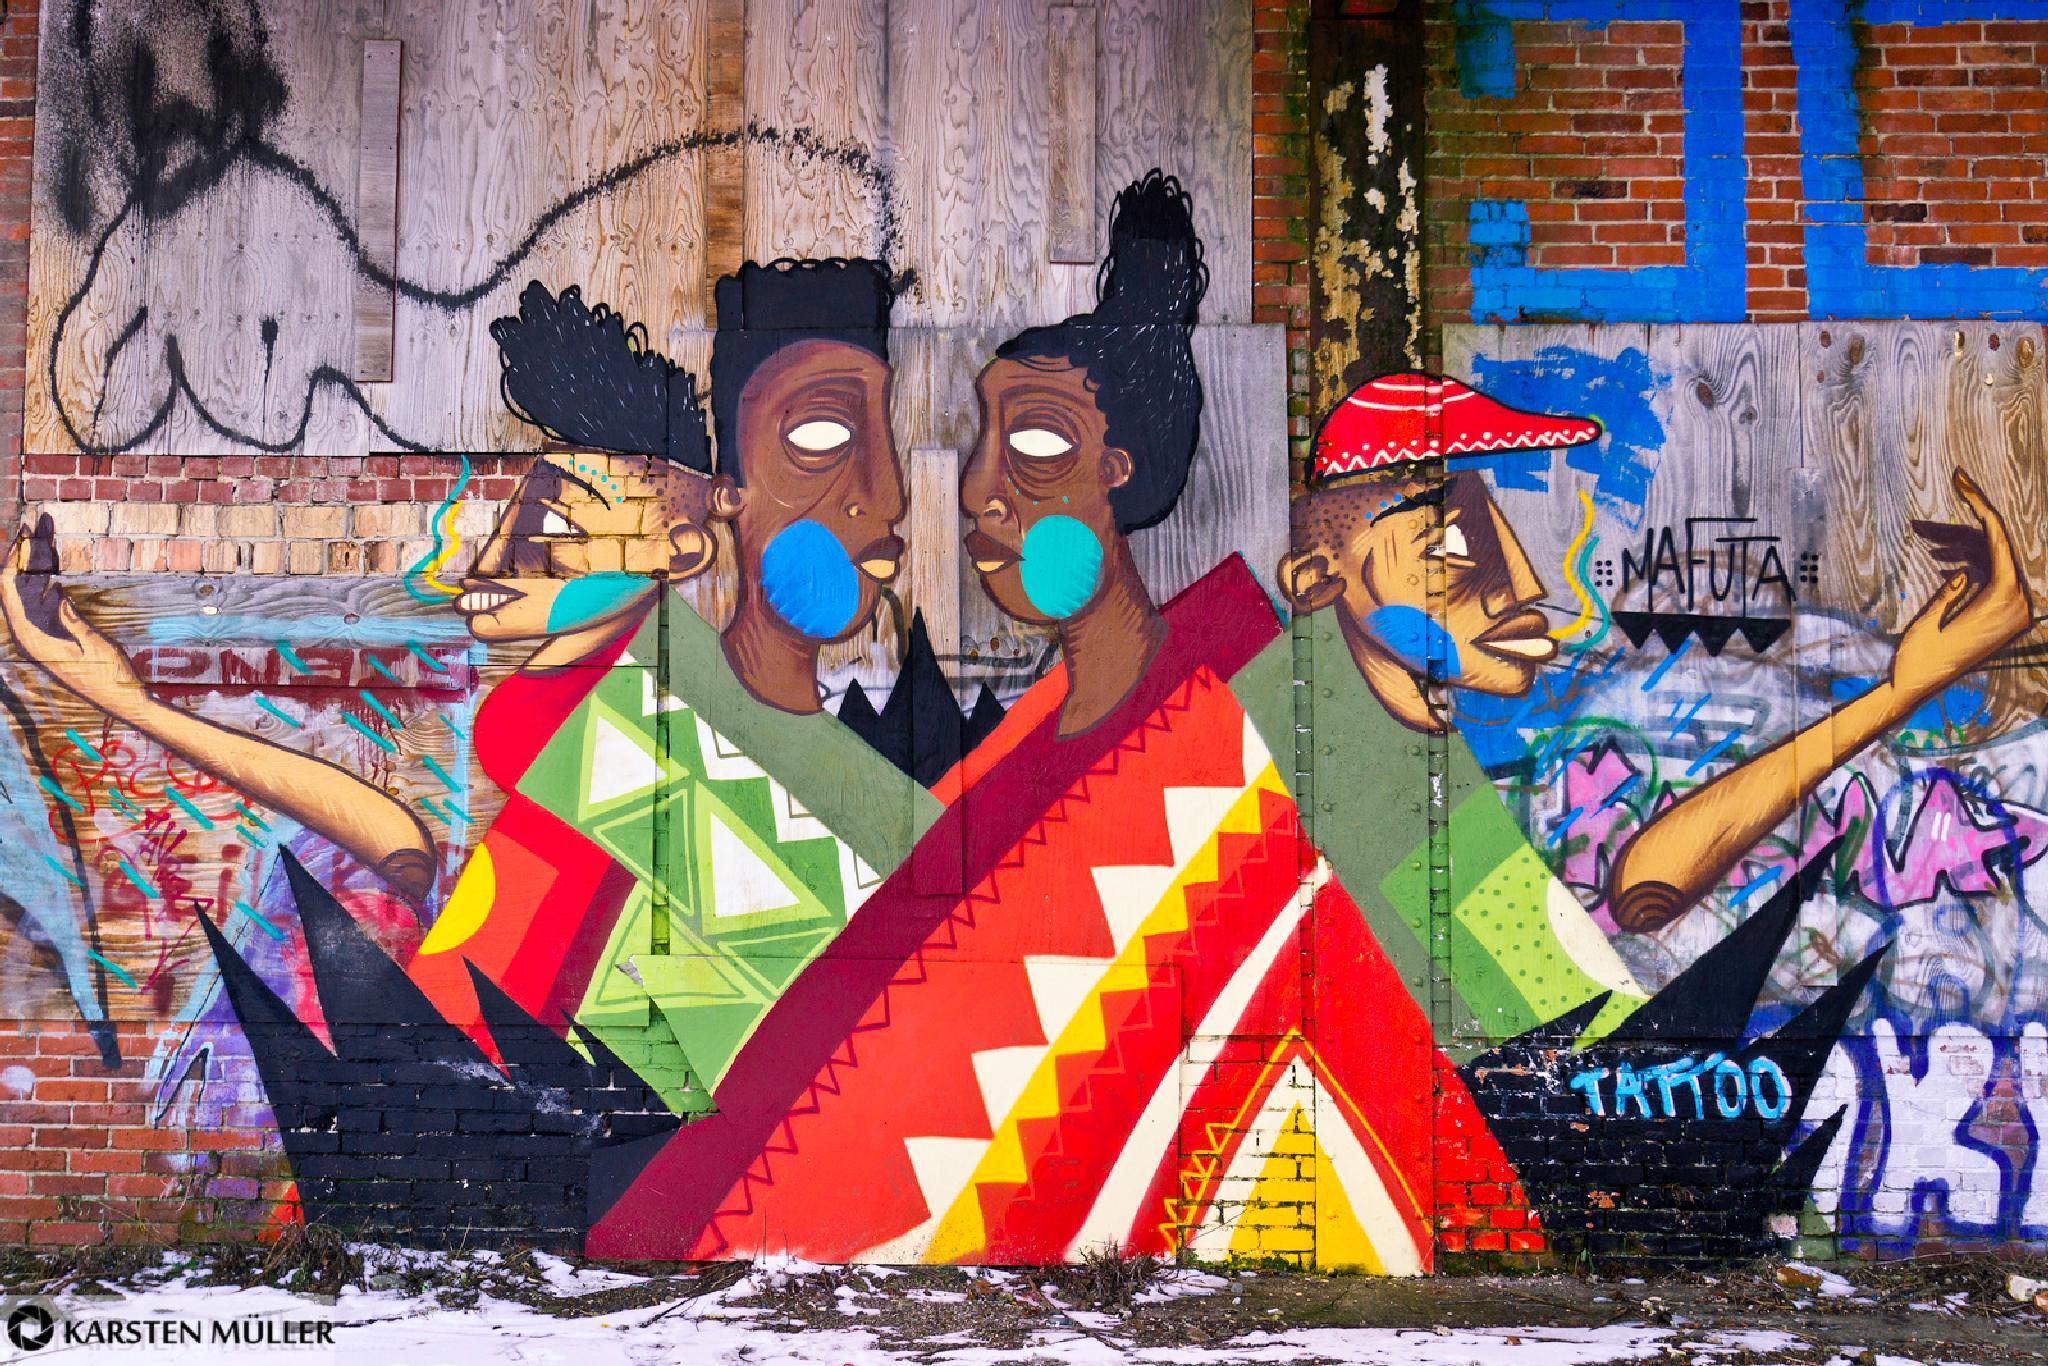 wall-art-VII by Xarroc DC